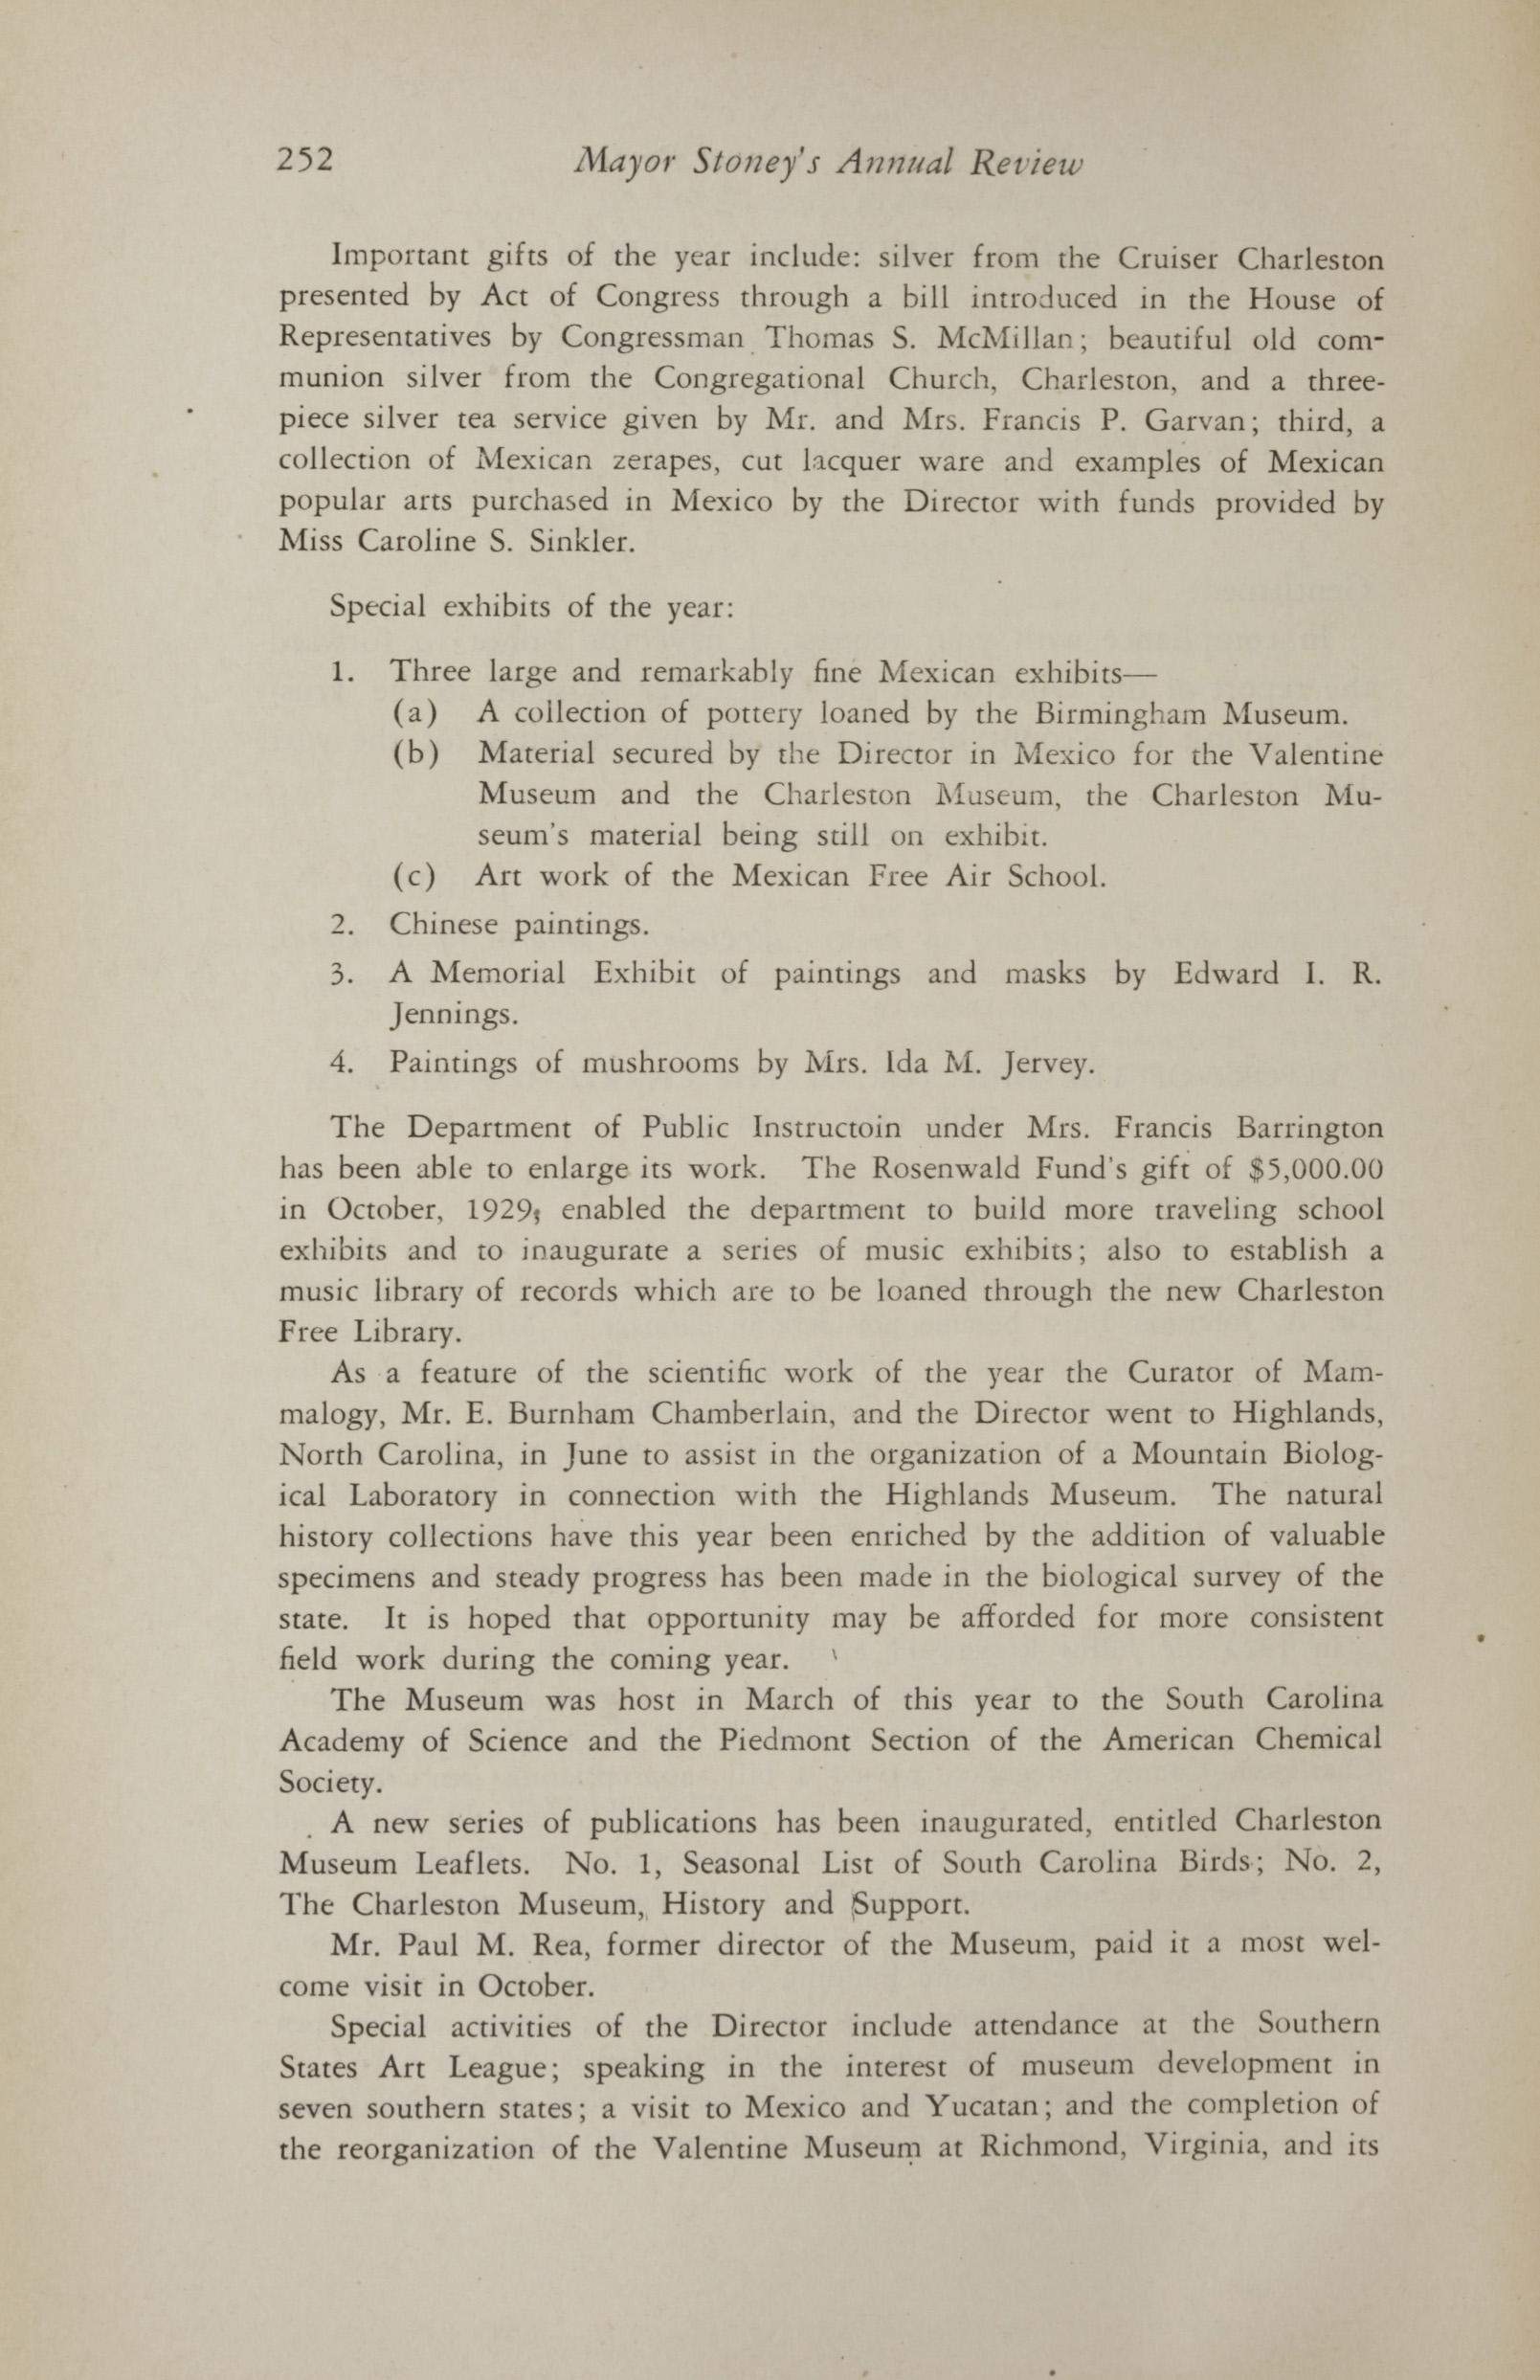 Charleston Yearbook, 1930, page 252